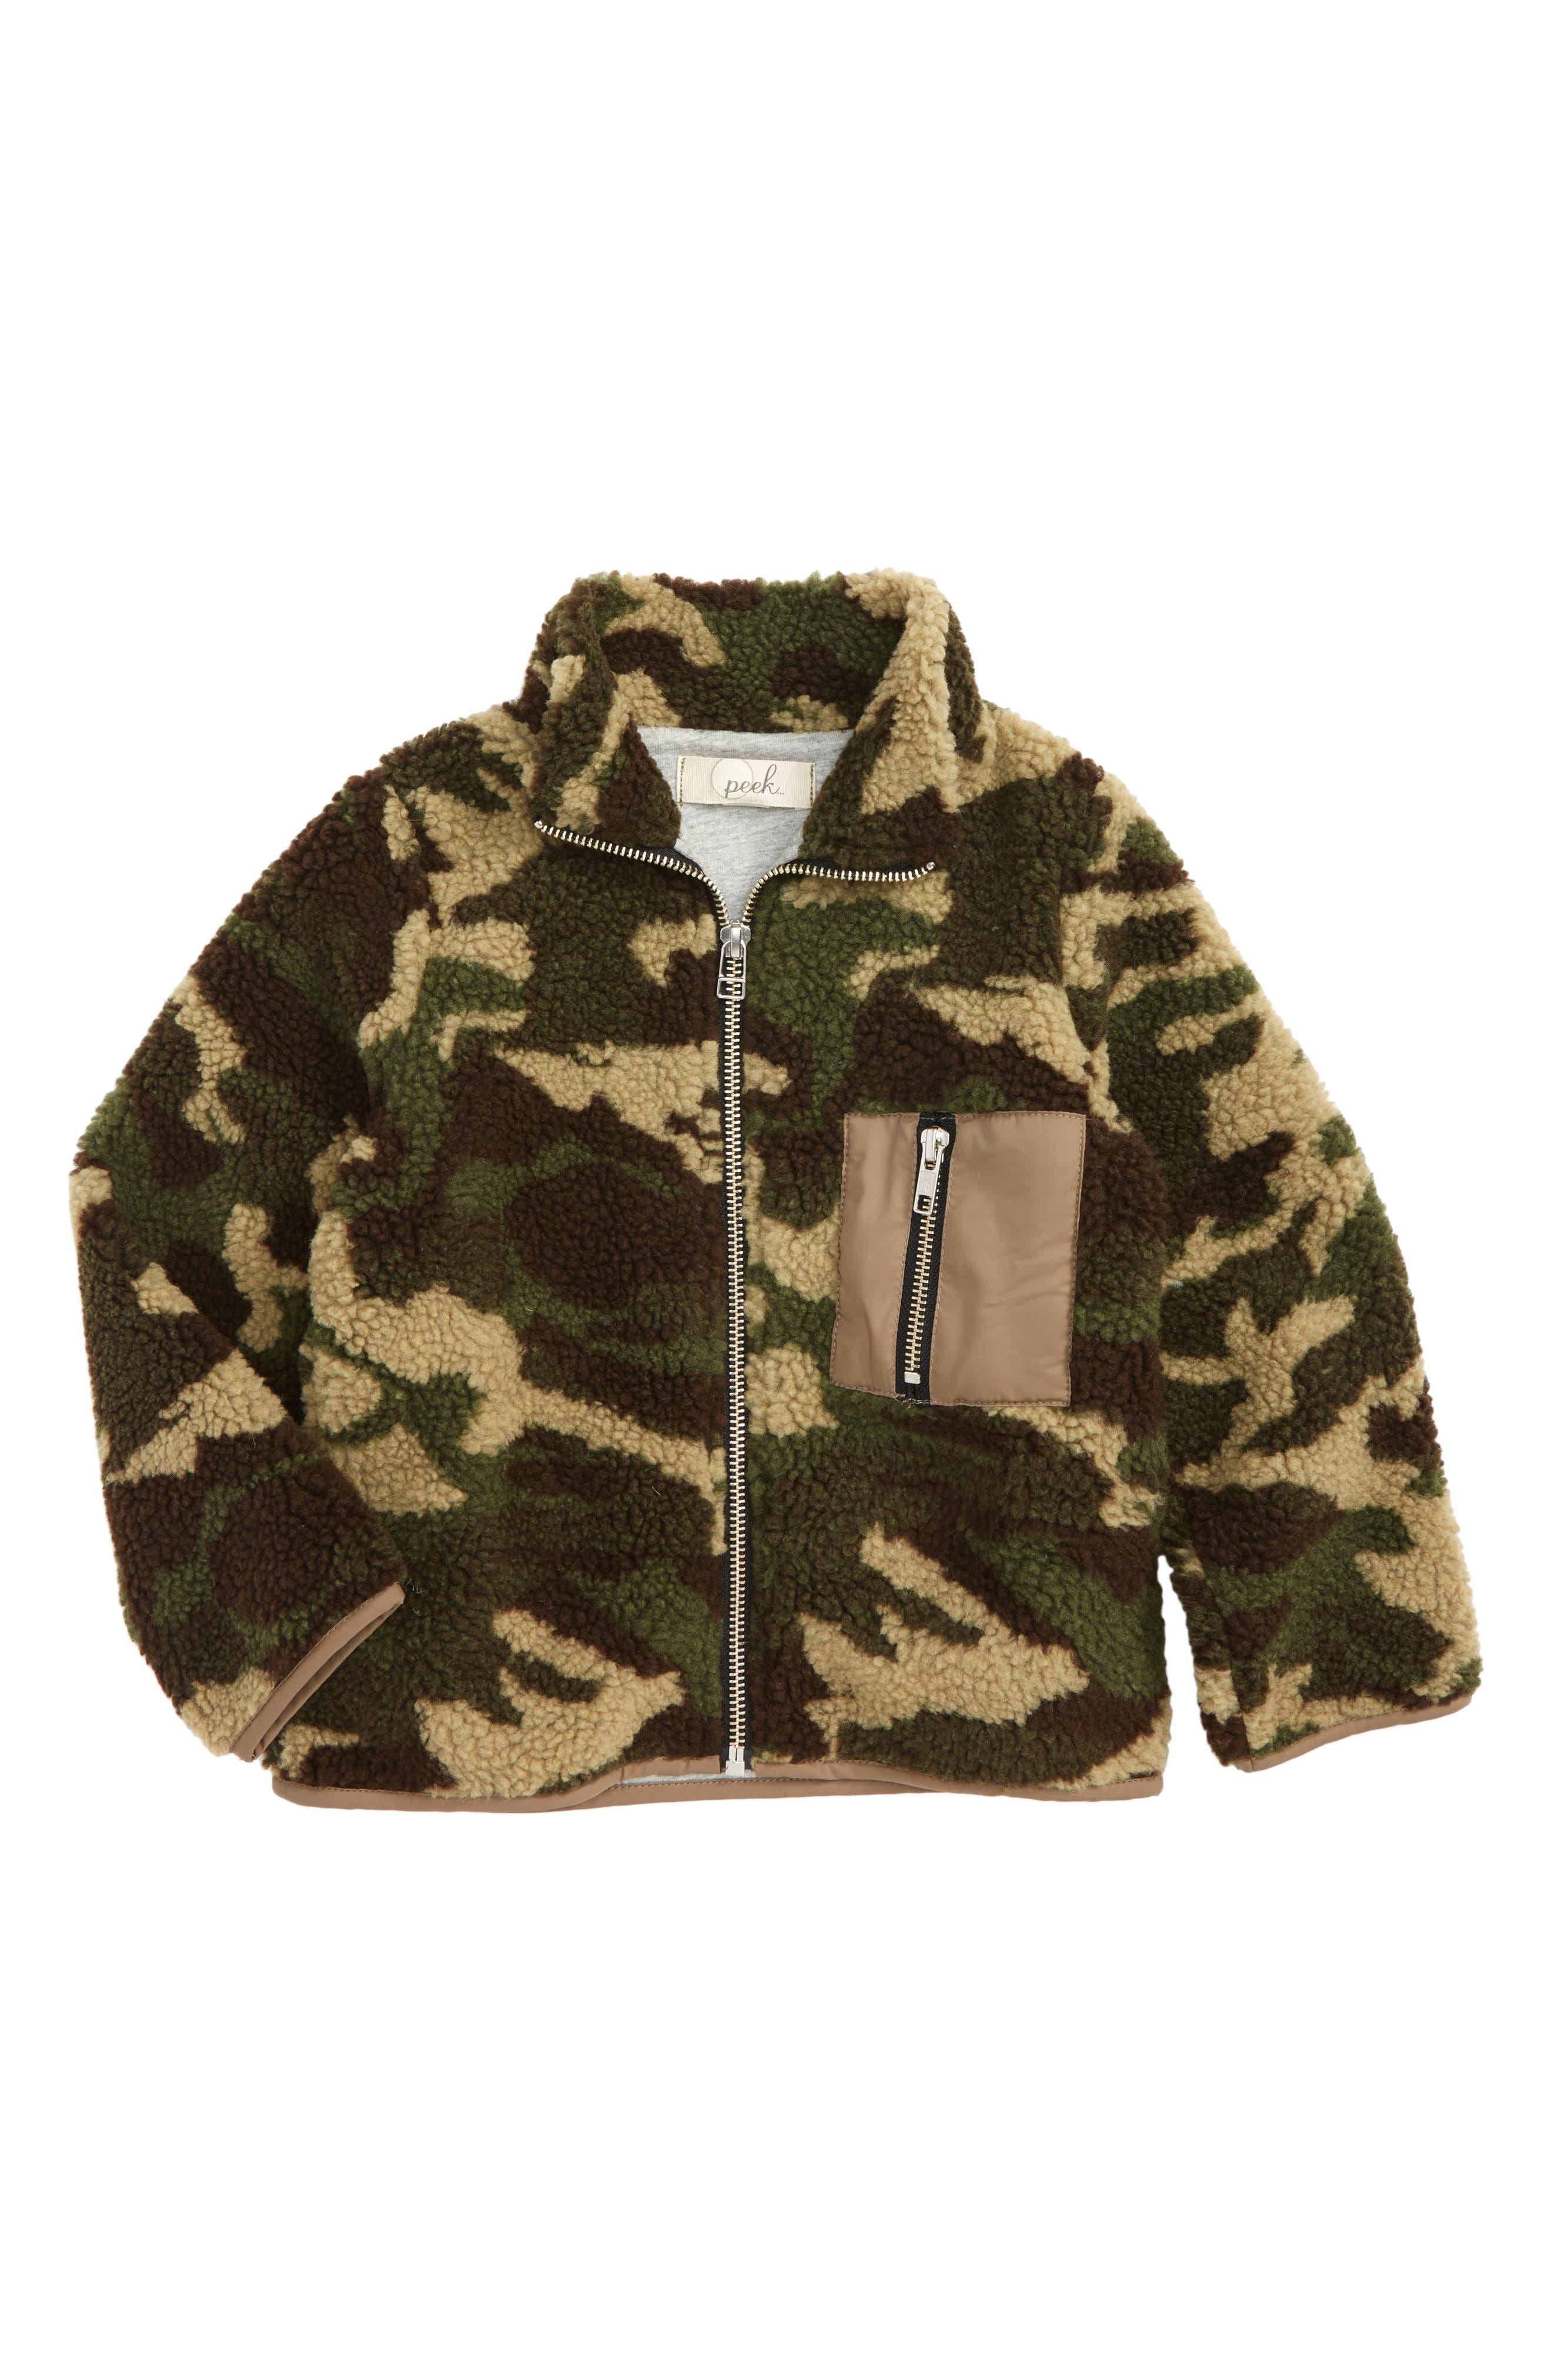 Alternate Image 1 Selected - Peek MJ Camo Fleece Jacket (Toddler Boys, Little Boys & Big Boys)